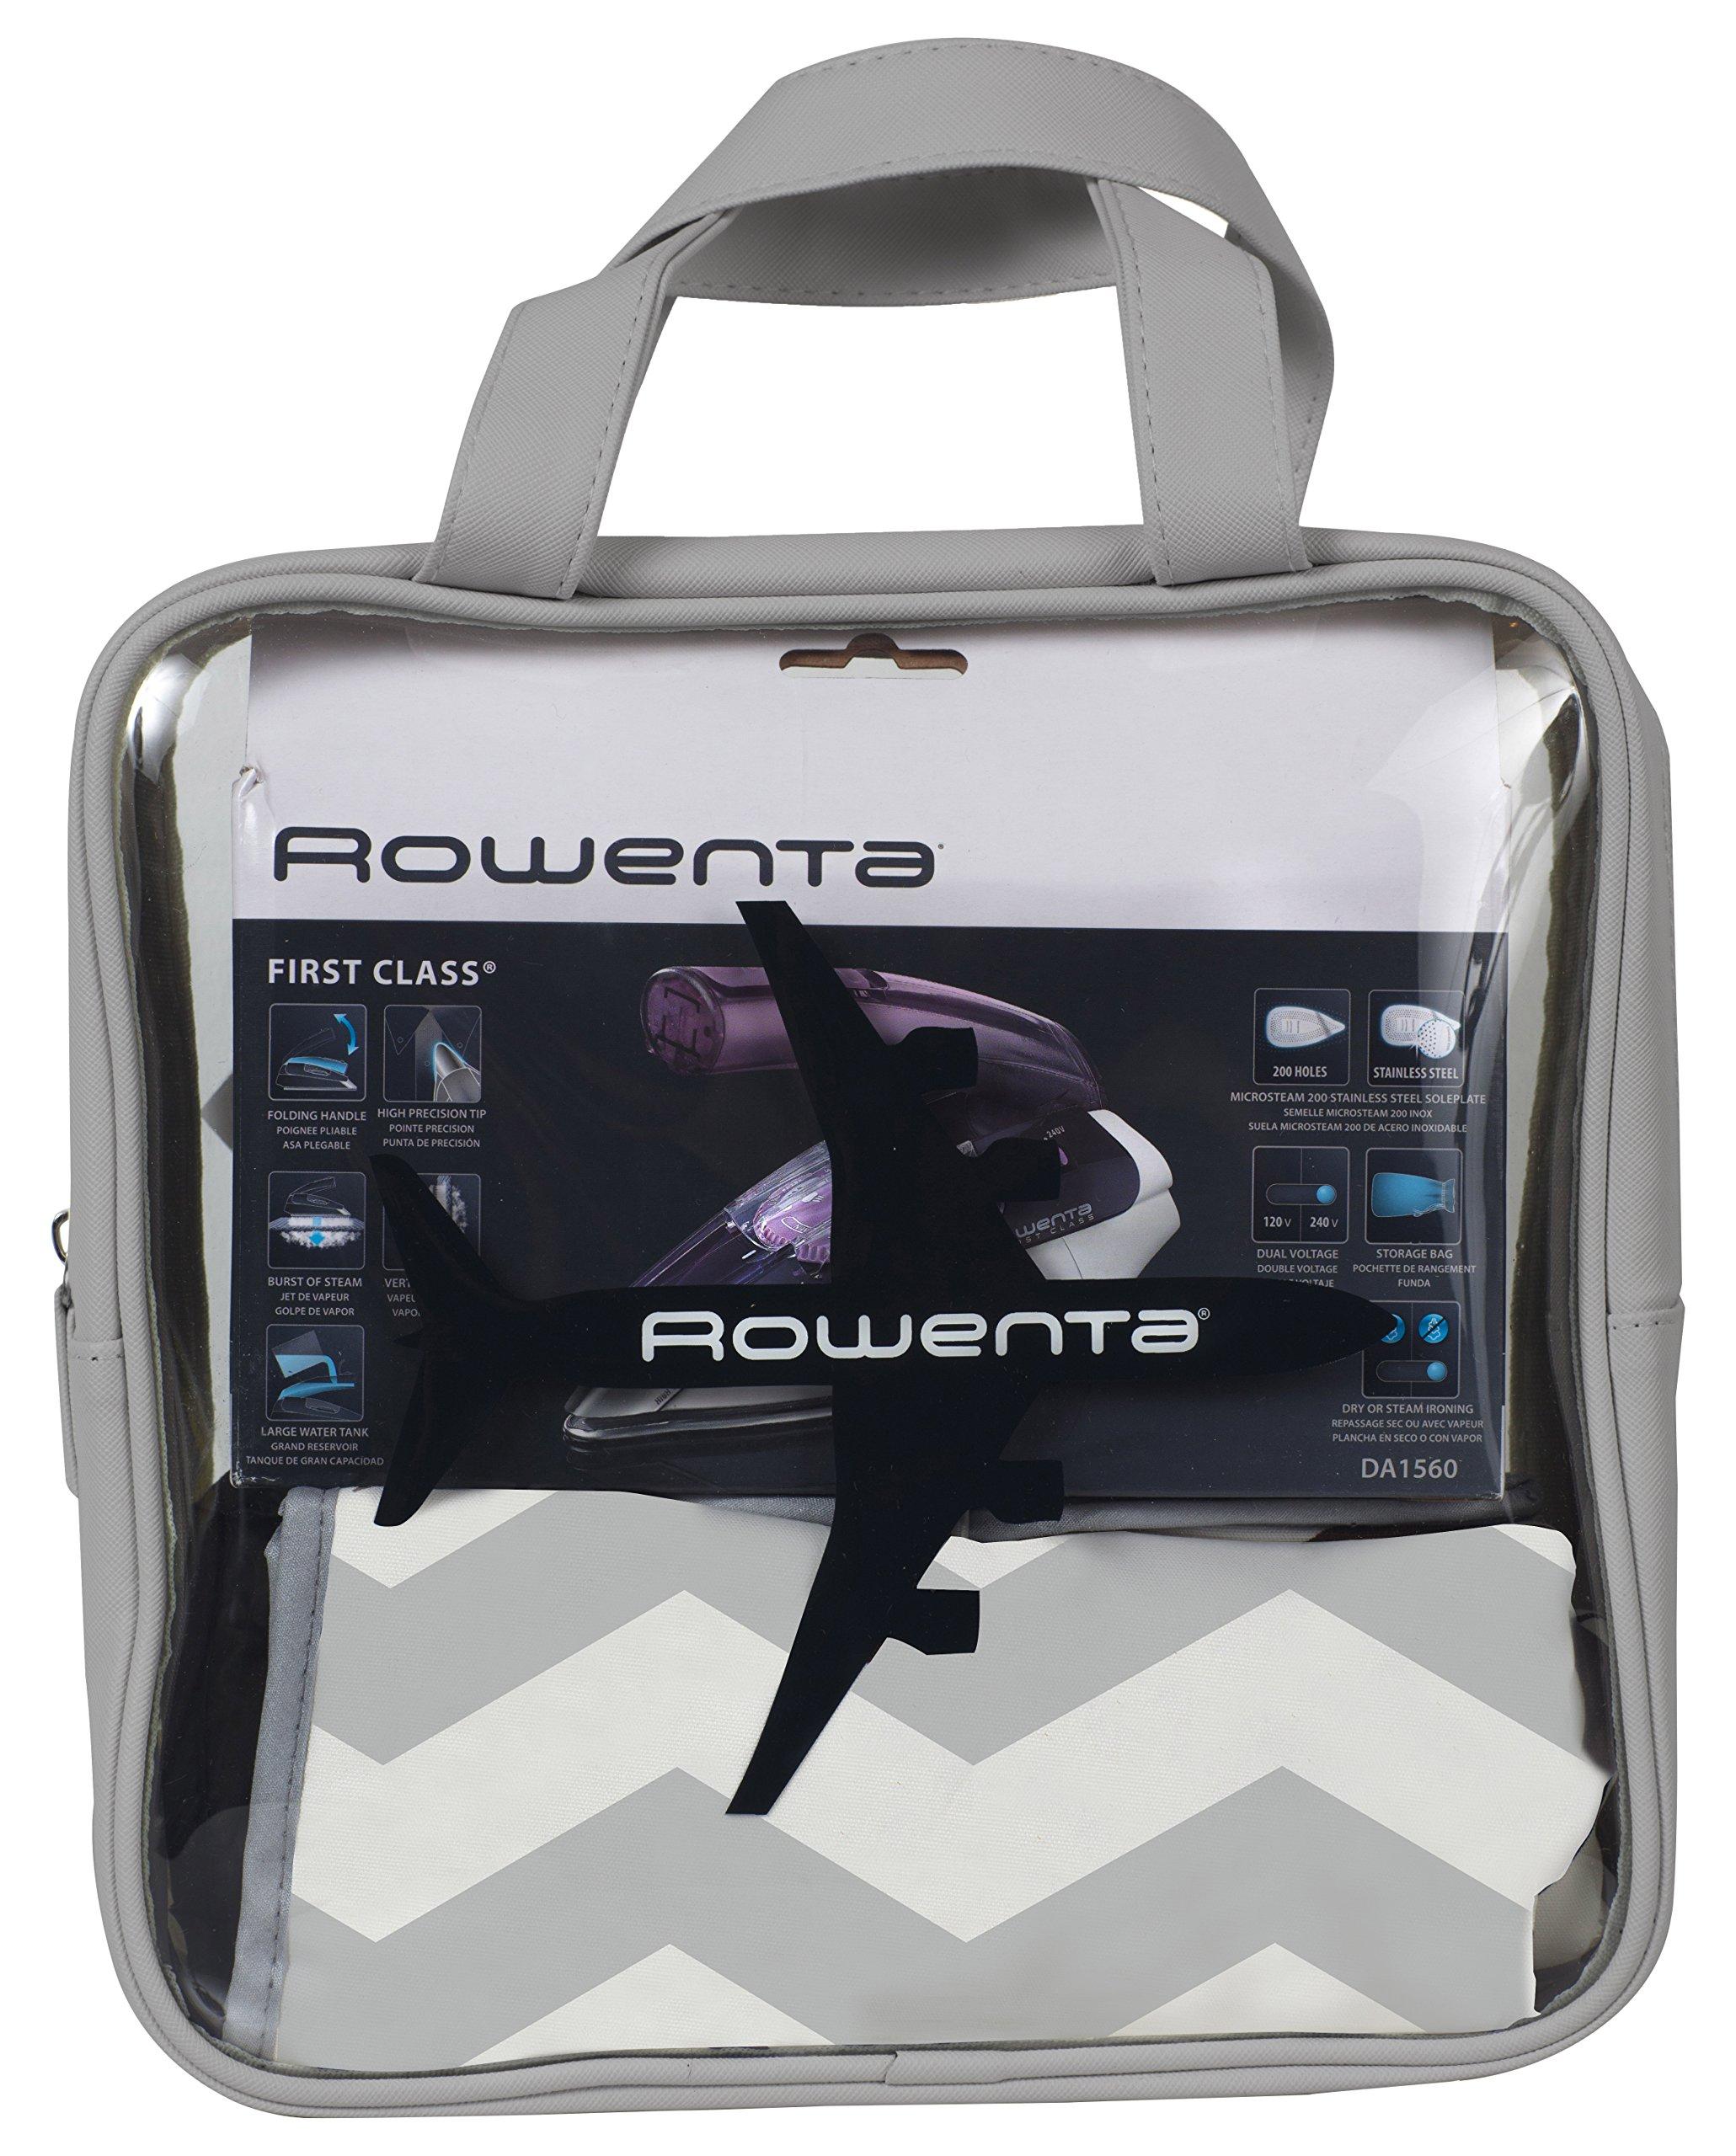 Rowenta 8400001621 Travel Bag, White